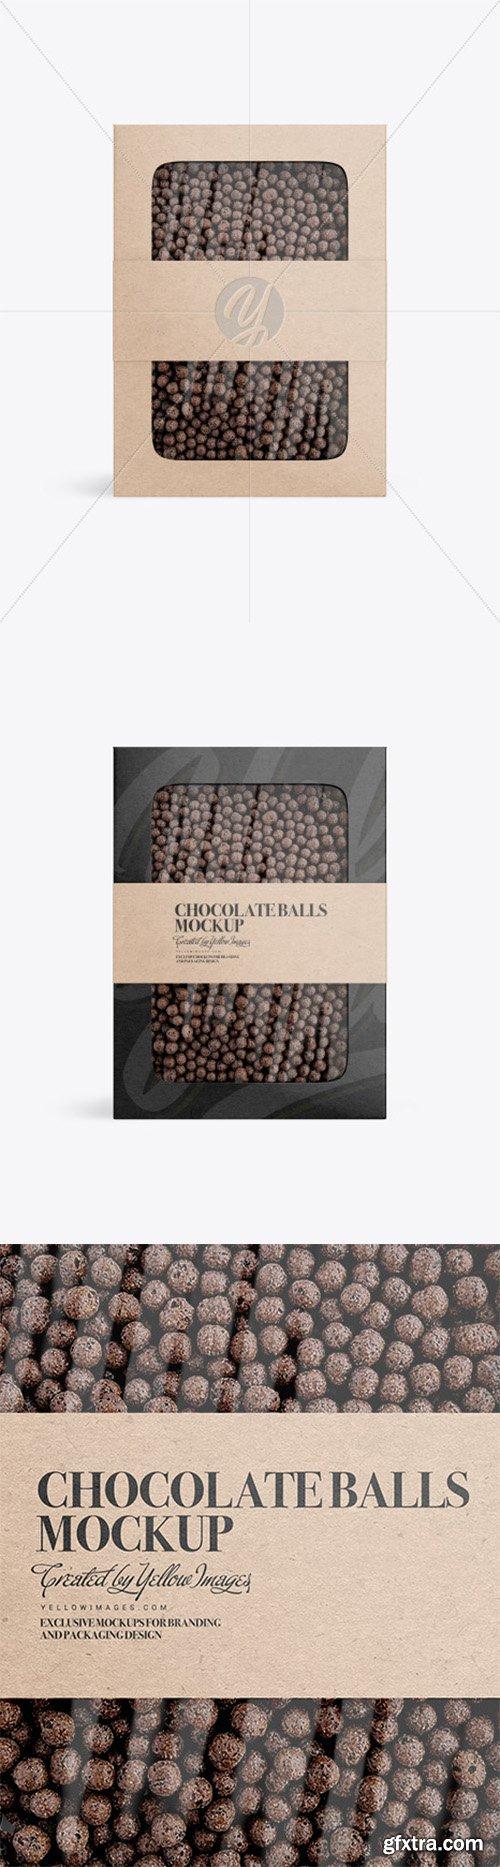 Kraft Paper Box With Chocolate Balls Mockup 80827